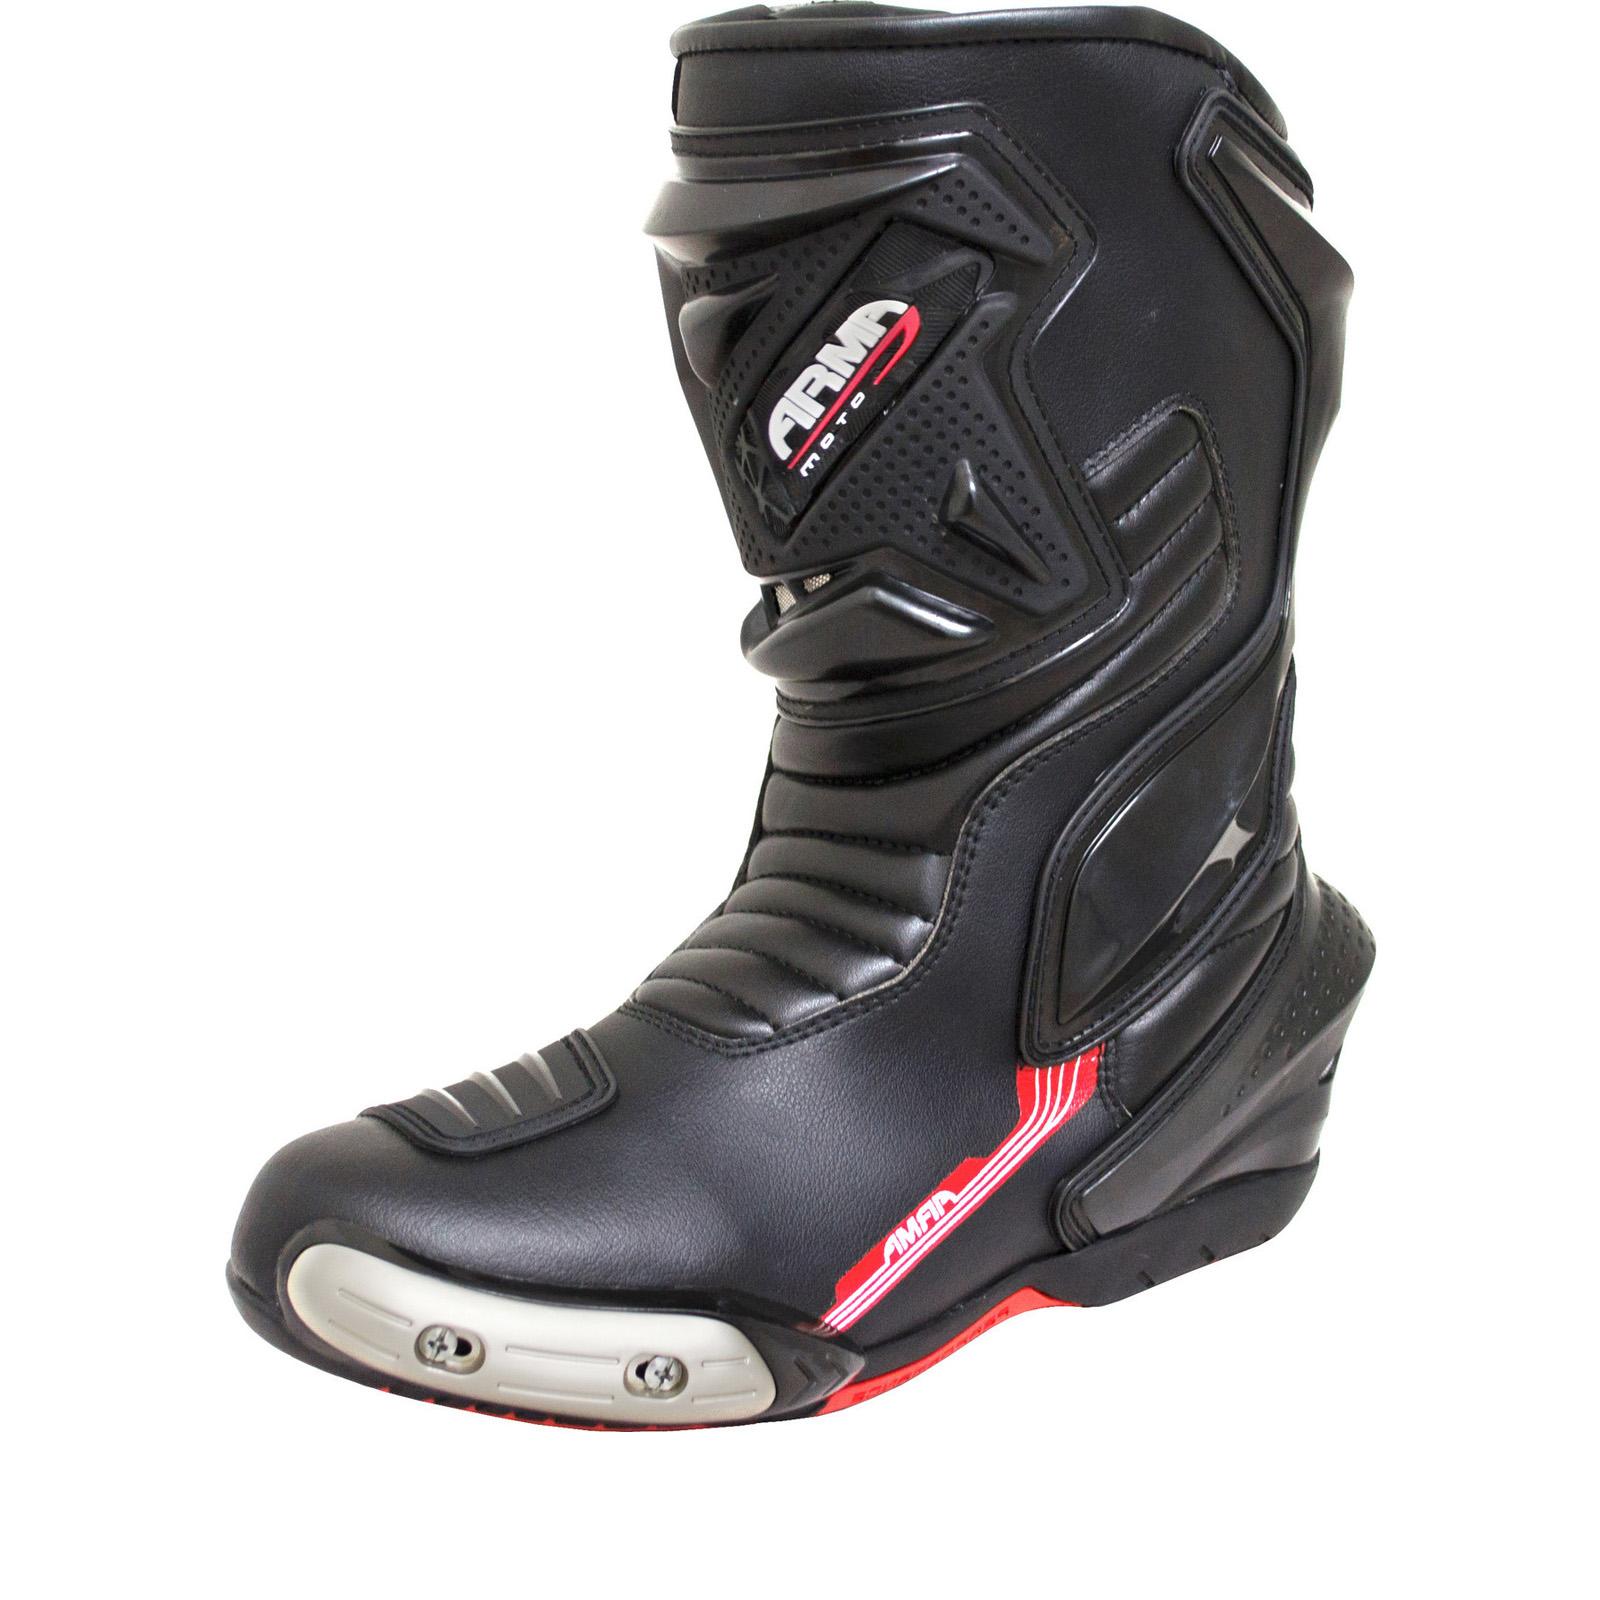 armr moto motegi wp leather motorcycle boots new. Black Bedroom Furniture Sets. Home Design Ideas